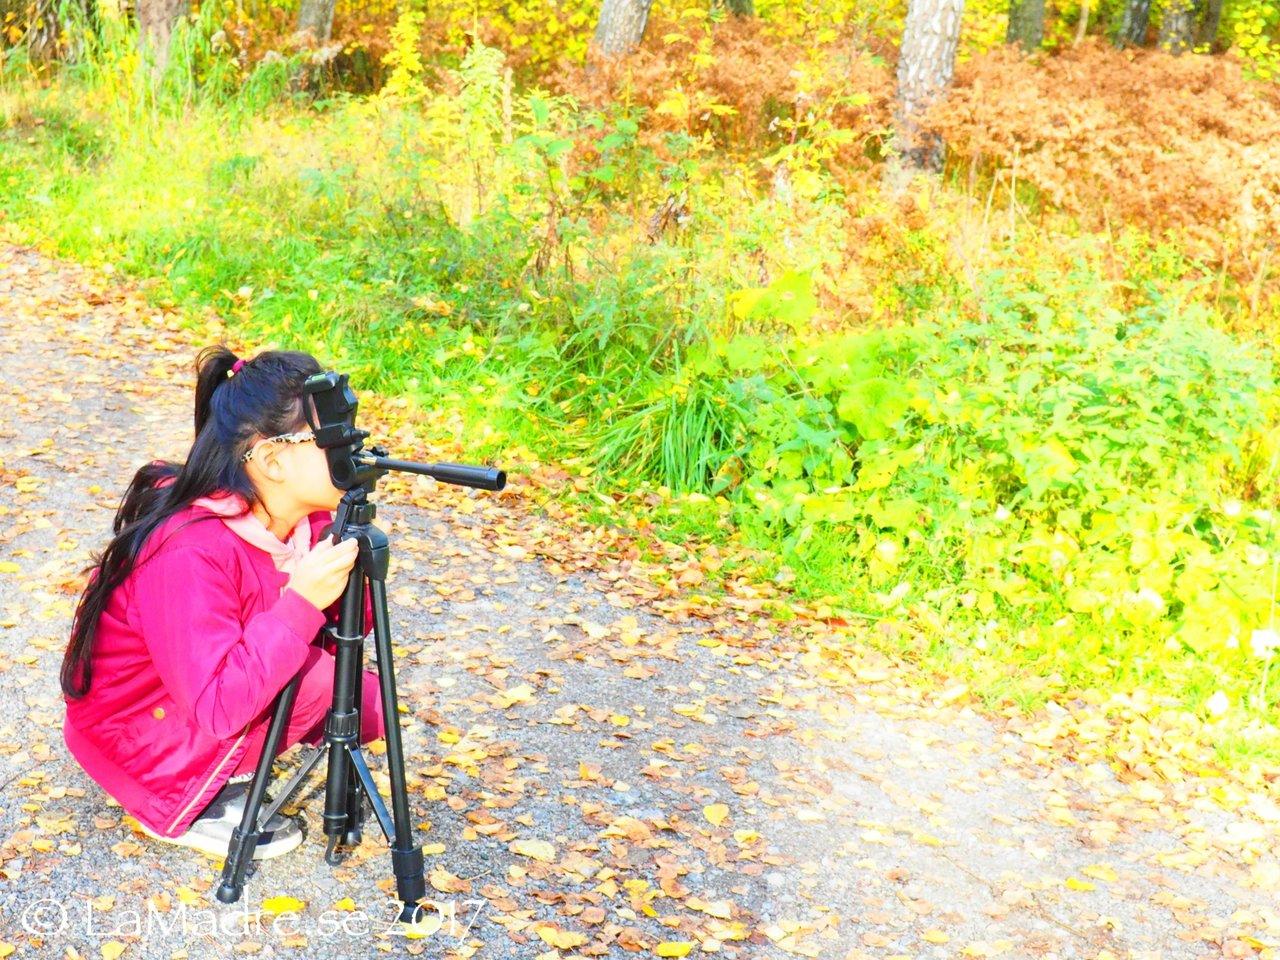 vackert_bilder_bloggare